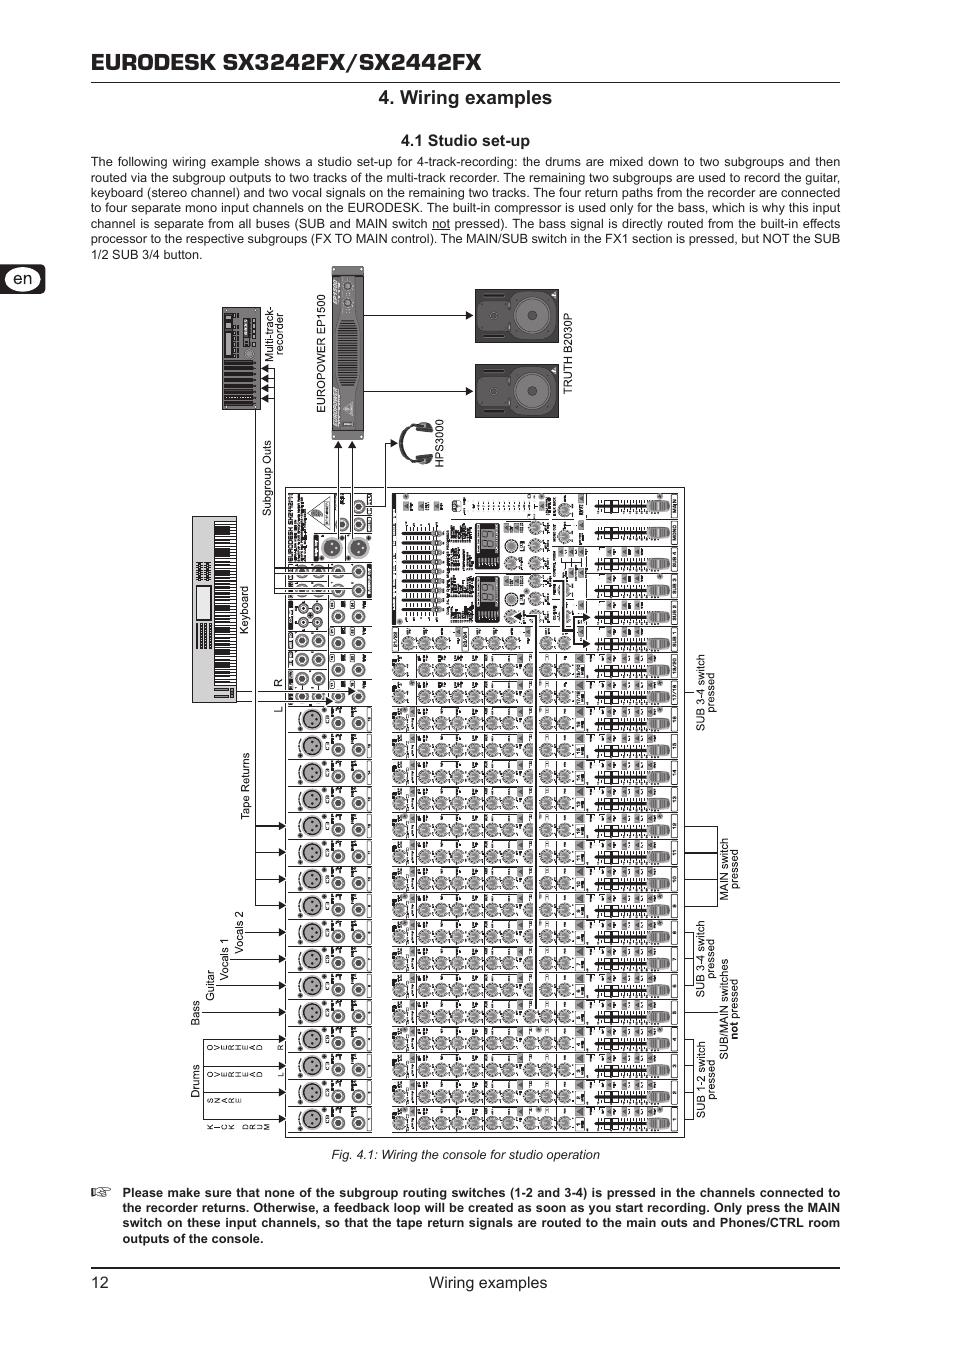 behringer-eurodesk-sx2442fx-page12  Sub Wiring Diagram on subwoofer diagram, radio diagram, dual voice coil speaker diagram, sub flooring diagram, sub control diagram, power diagram, amp diagram, sub assembly diagram, sub pump diagram, sub controller diagram,